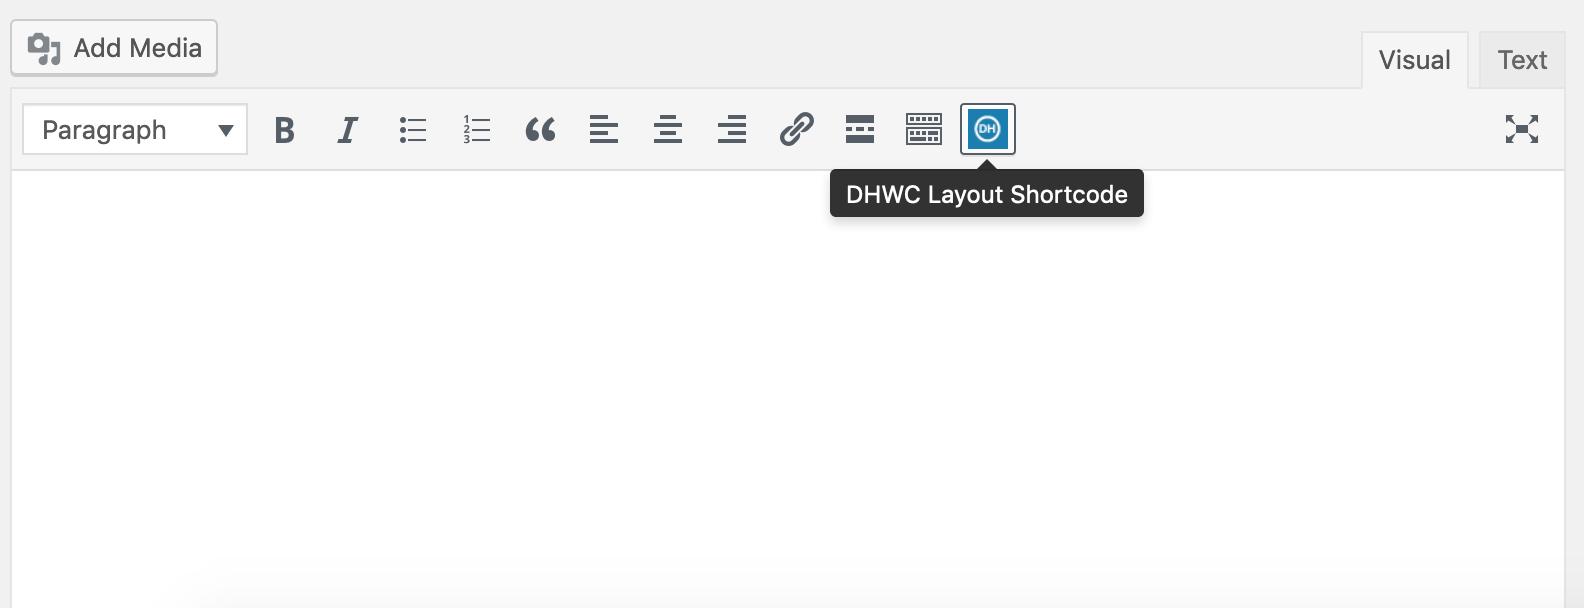 DHWCLayout - Layouts de produtos de comércio Woocommerce - 3